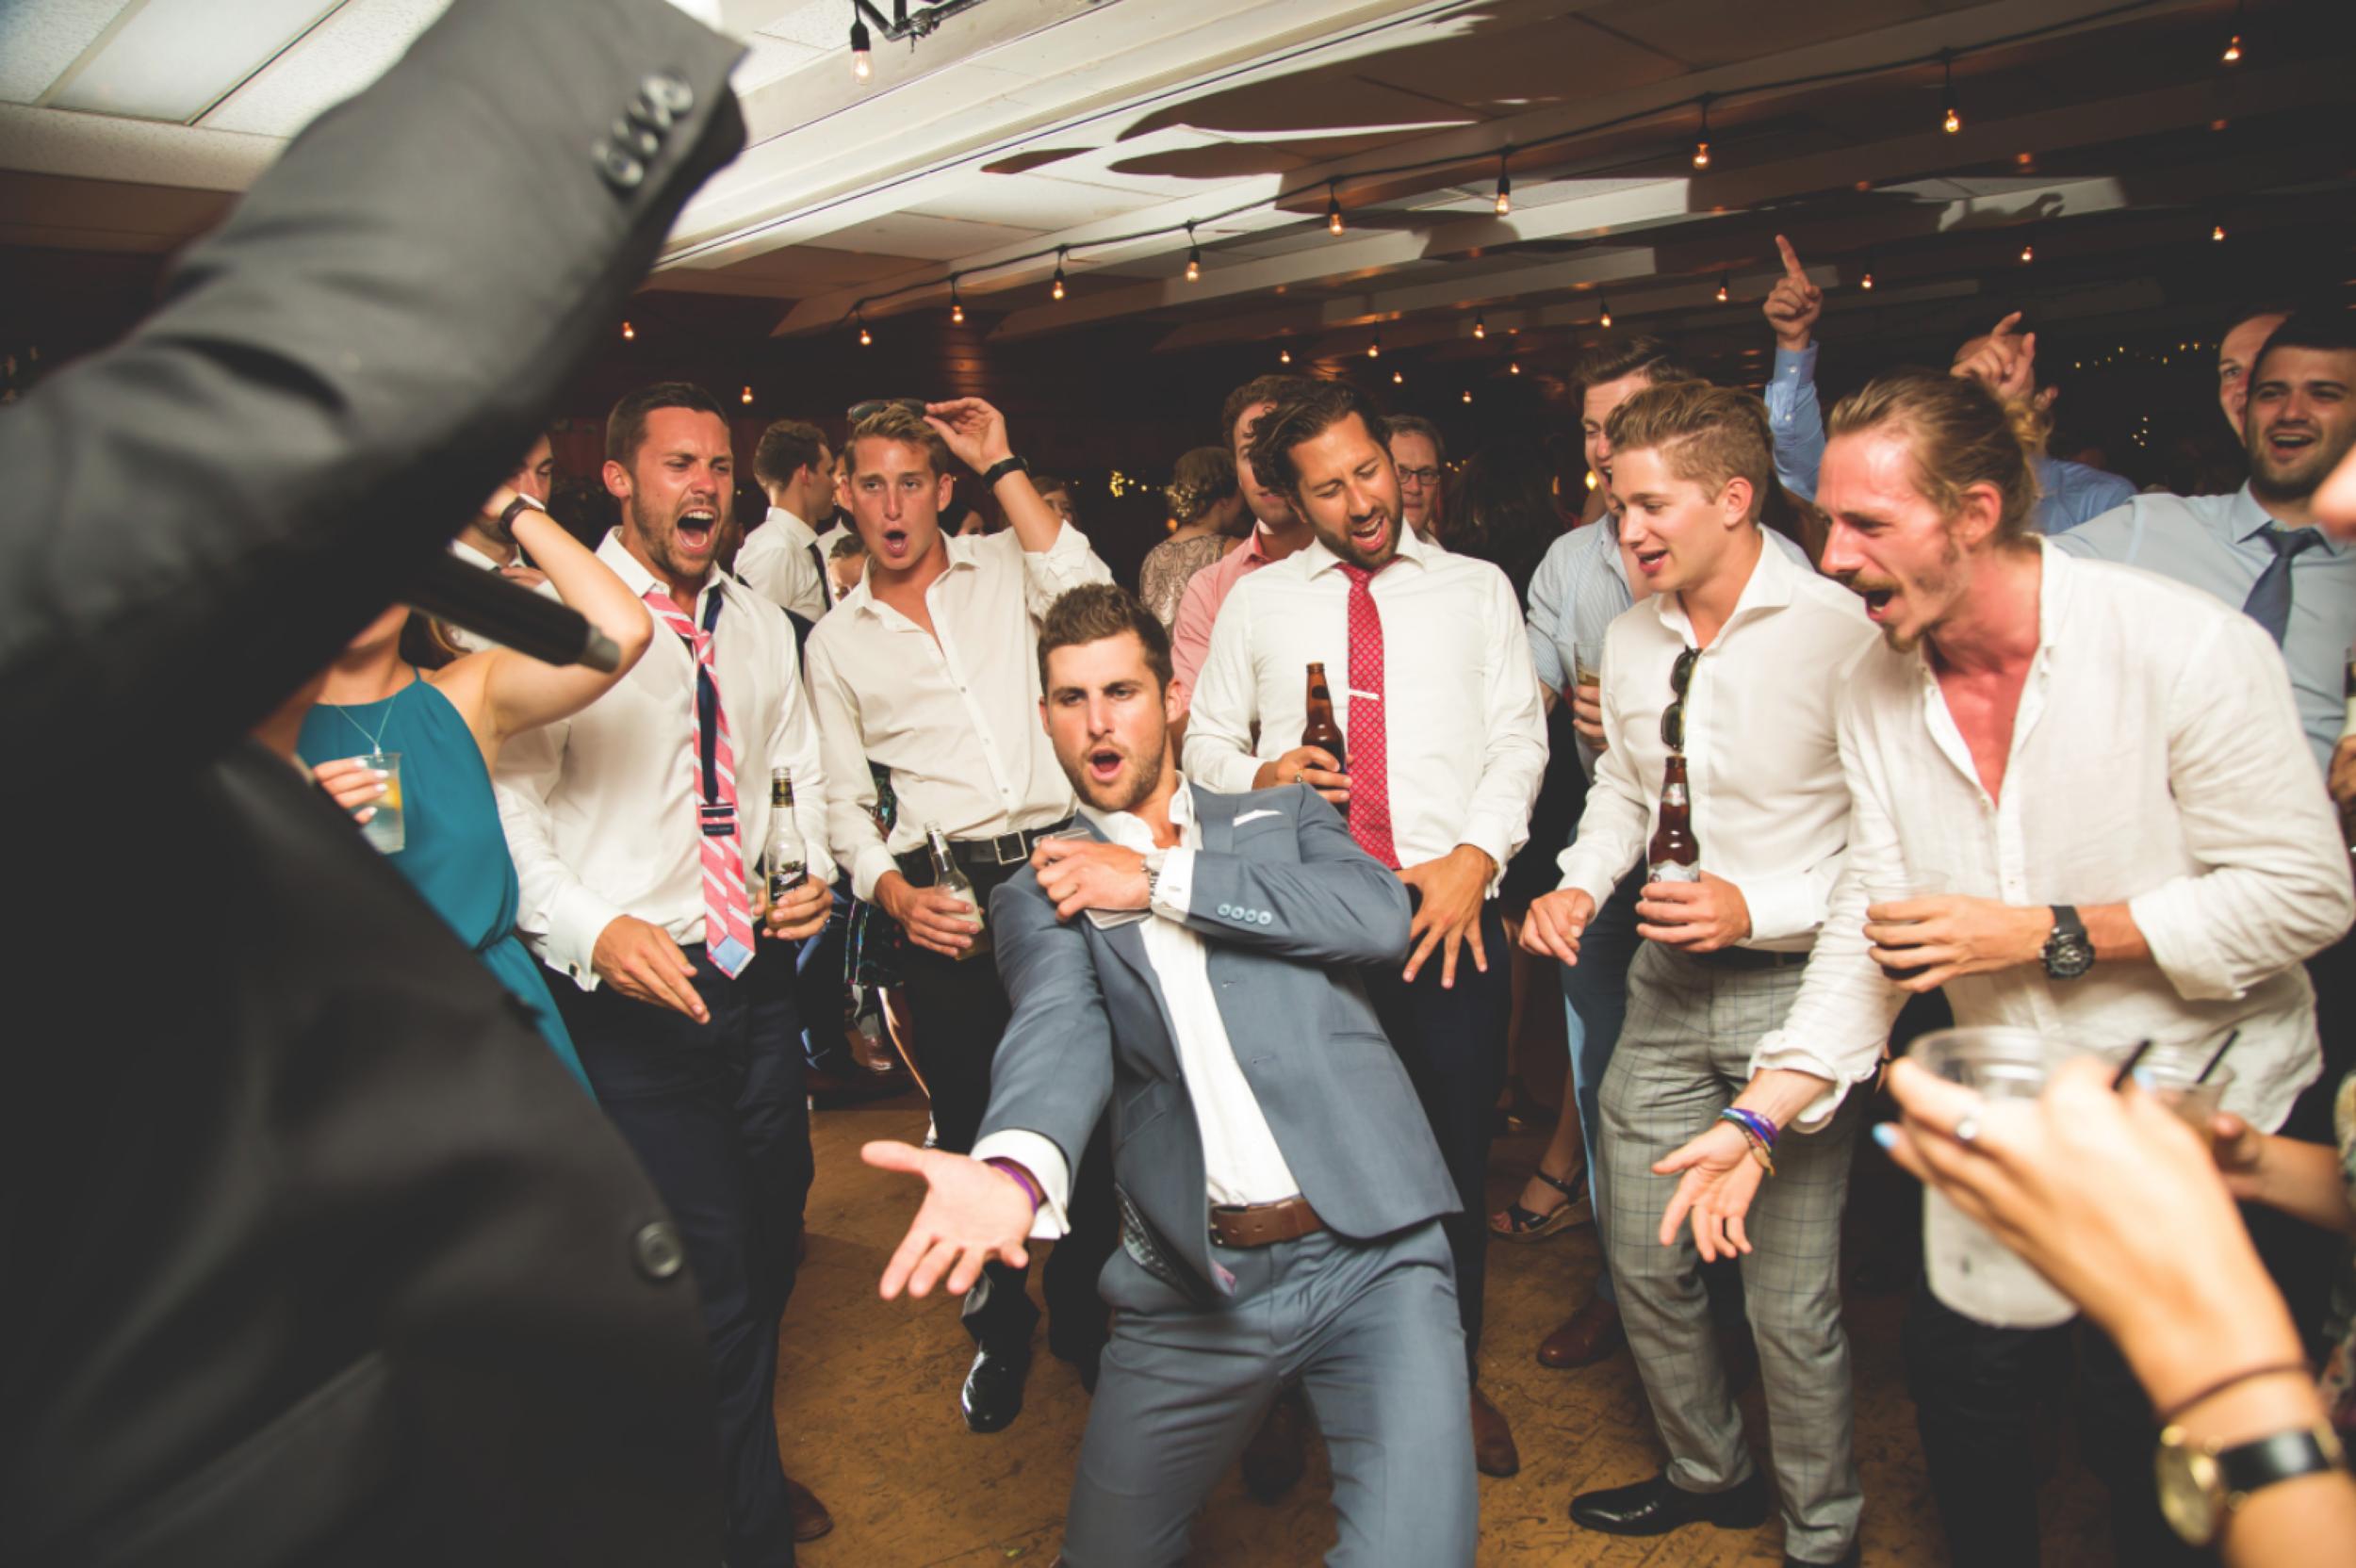 Wedding-Photos-Muskoka-Clevelands-House-Photographer-Wedding-Hamilton-GTA-Niagara-Oakville-Moments-by-Lauren-Photography-Photo-Image-113.png